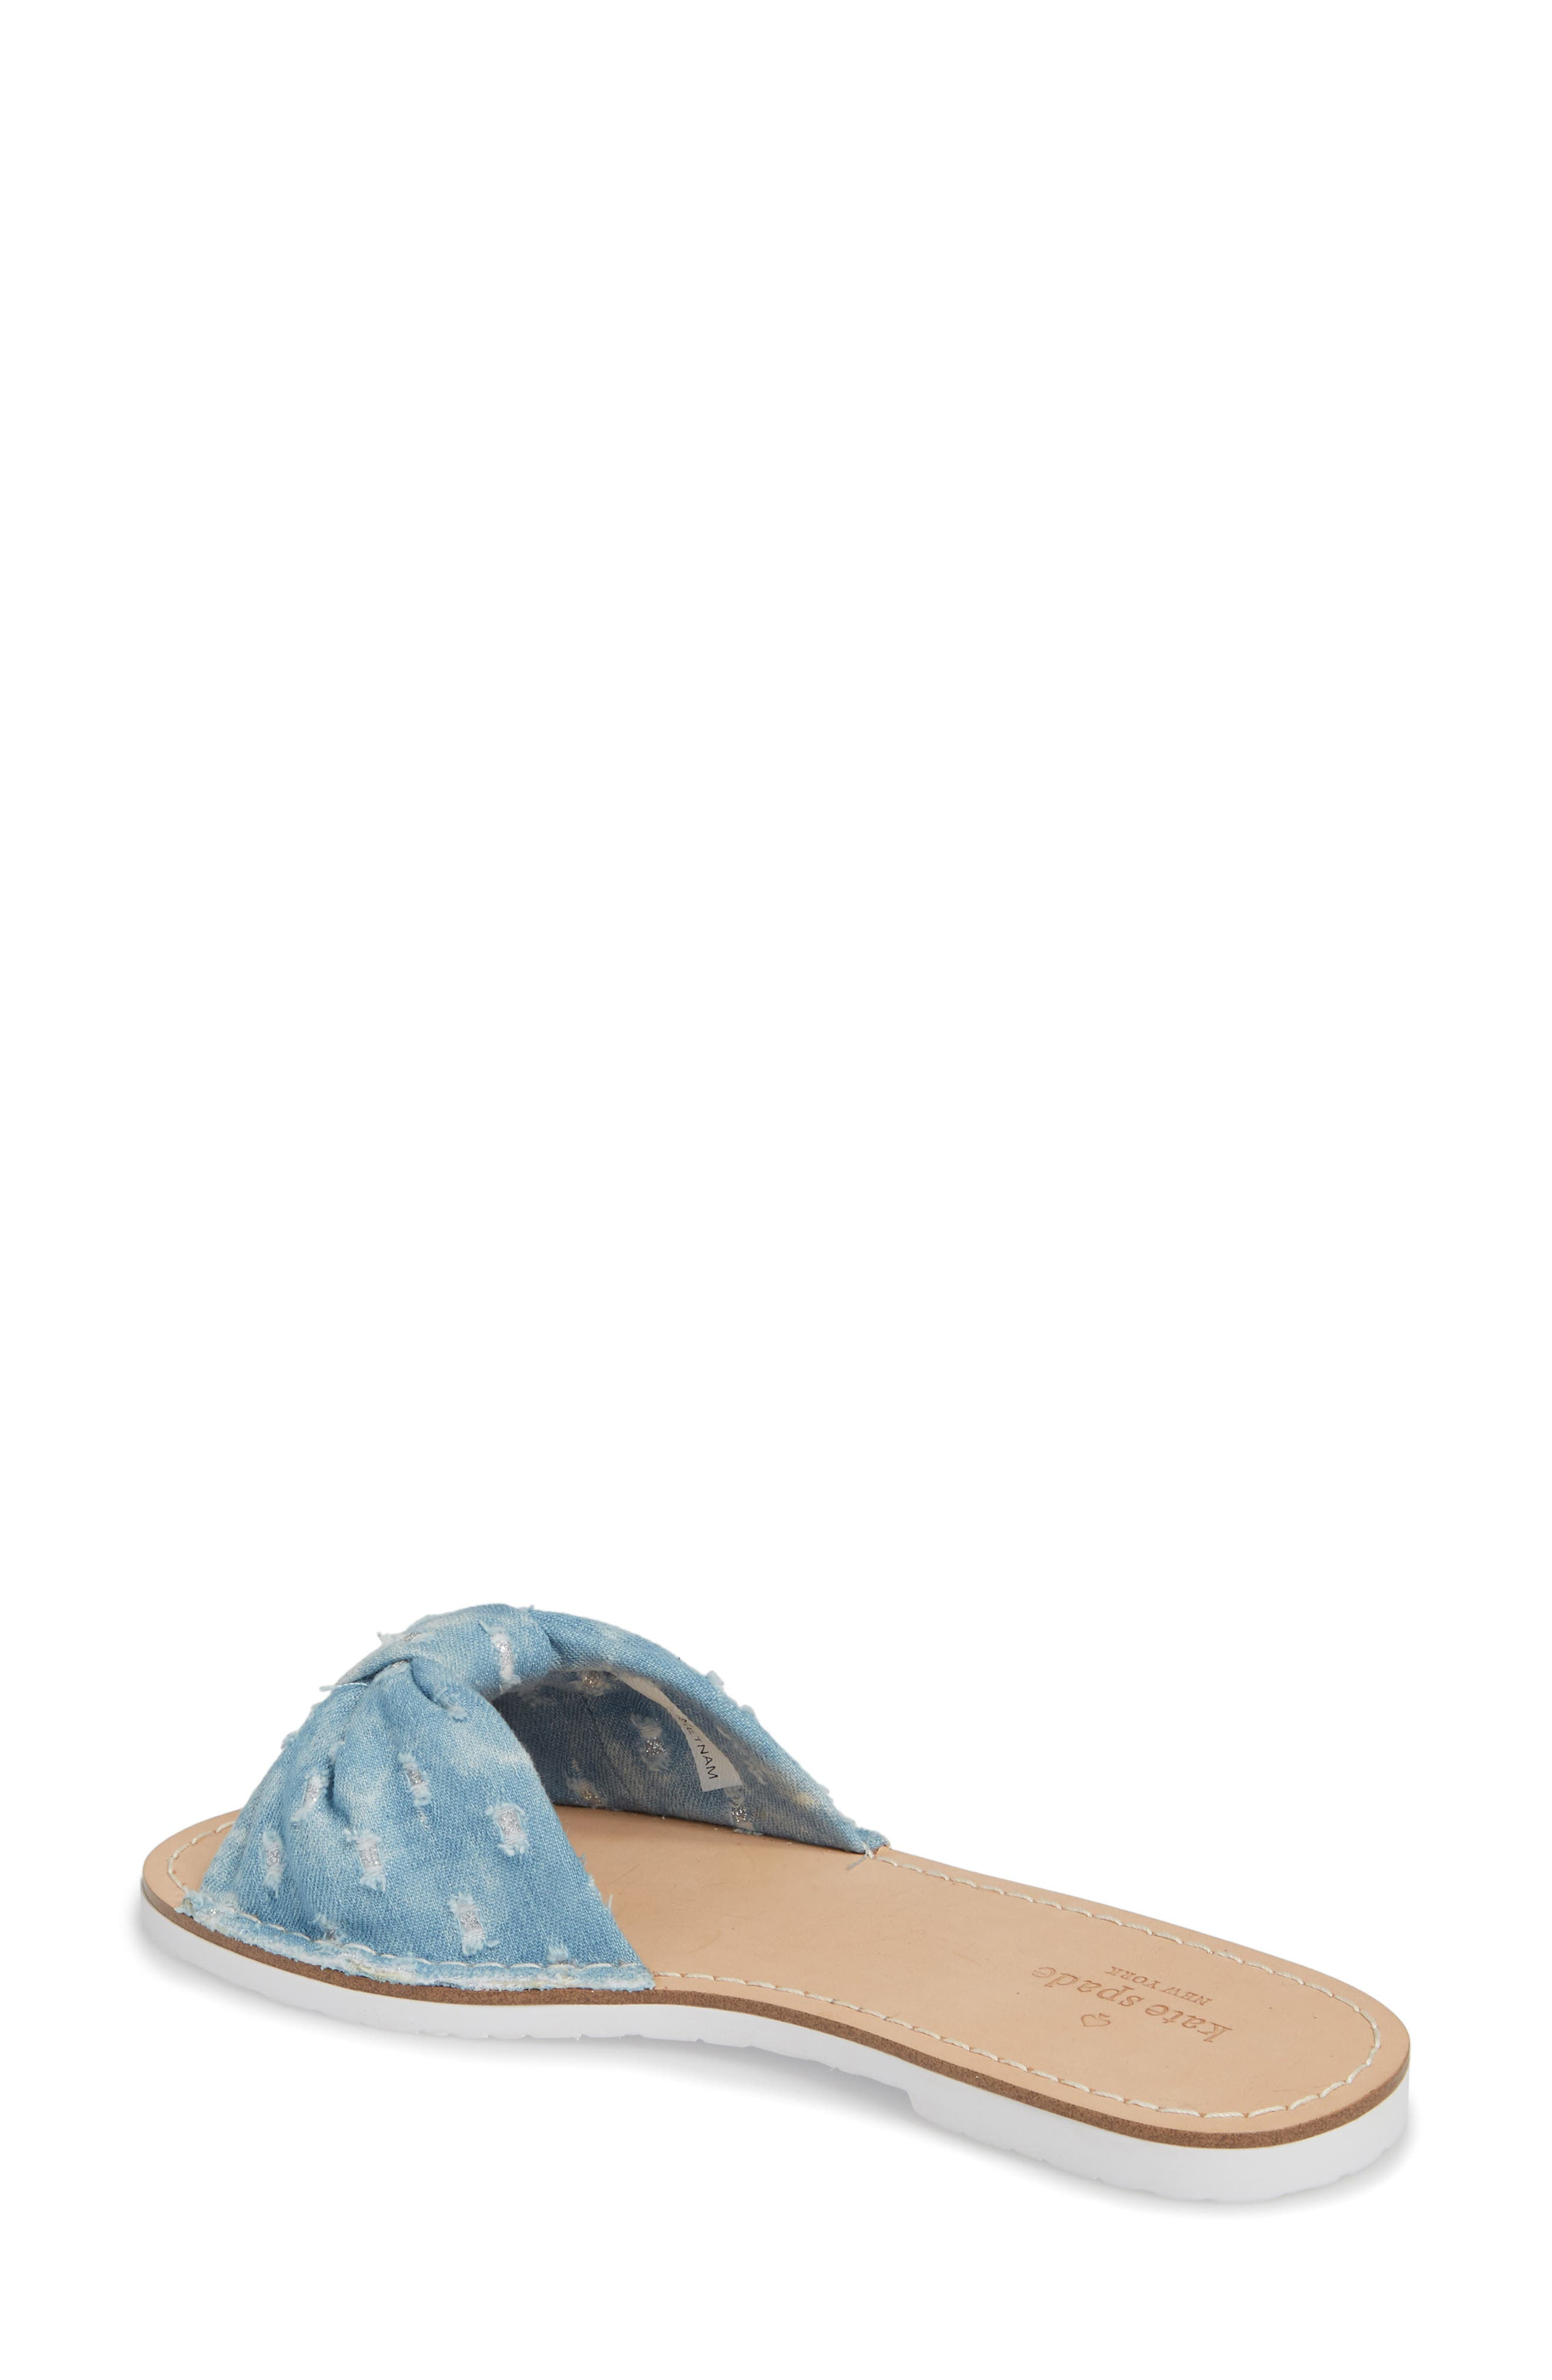 indi slide sandal,                             Alternate thumbnail 4, color,